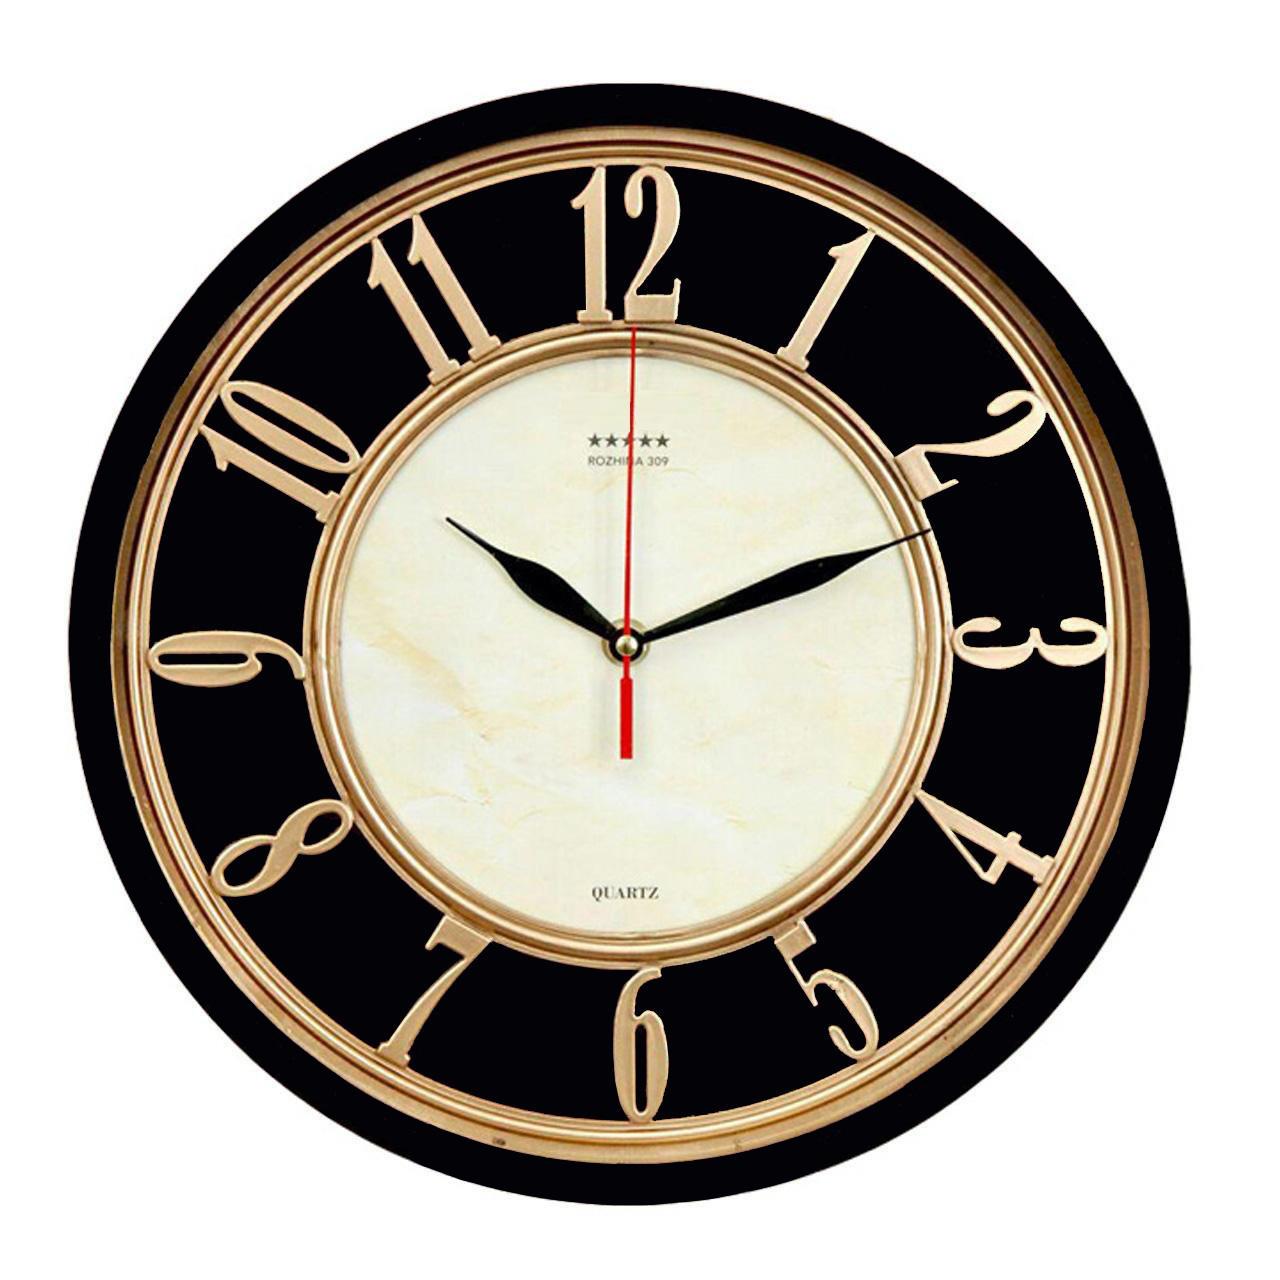 ساعت دیواری روژینا کد 309 به همراه هدیه سرسوئیچی ویکتوریا